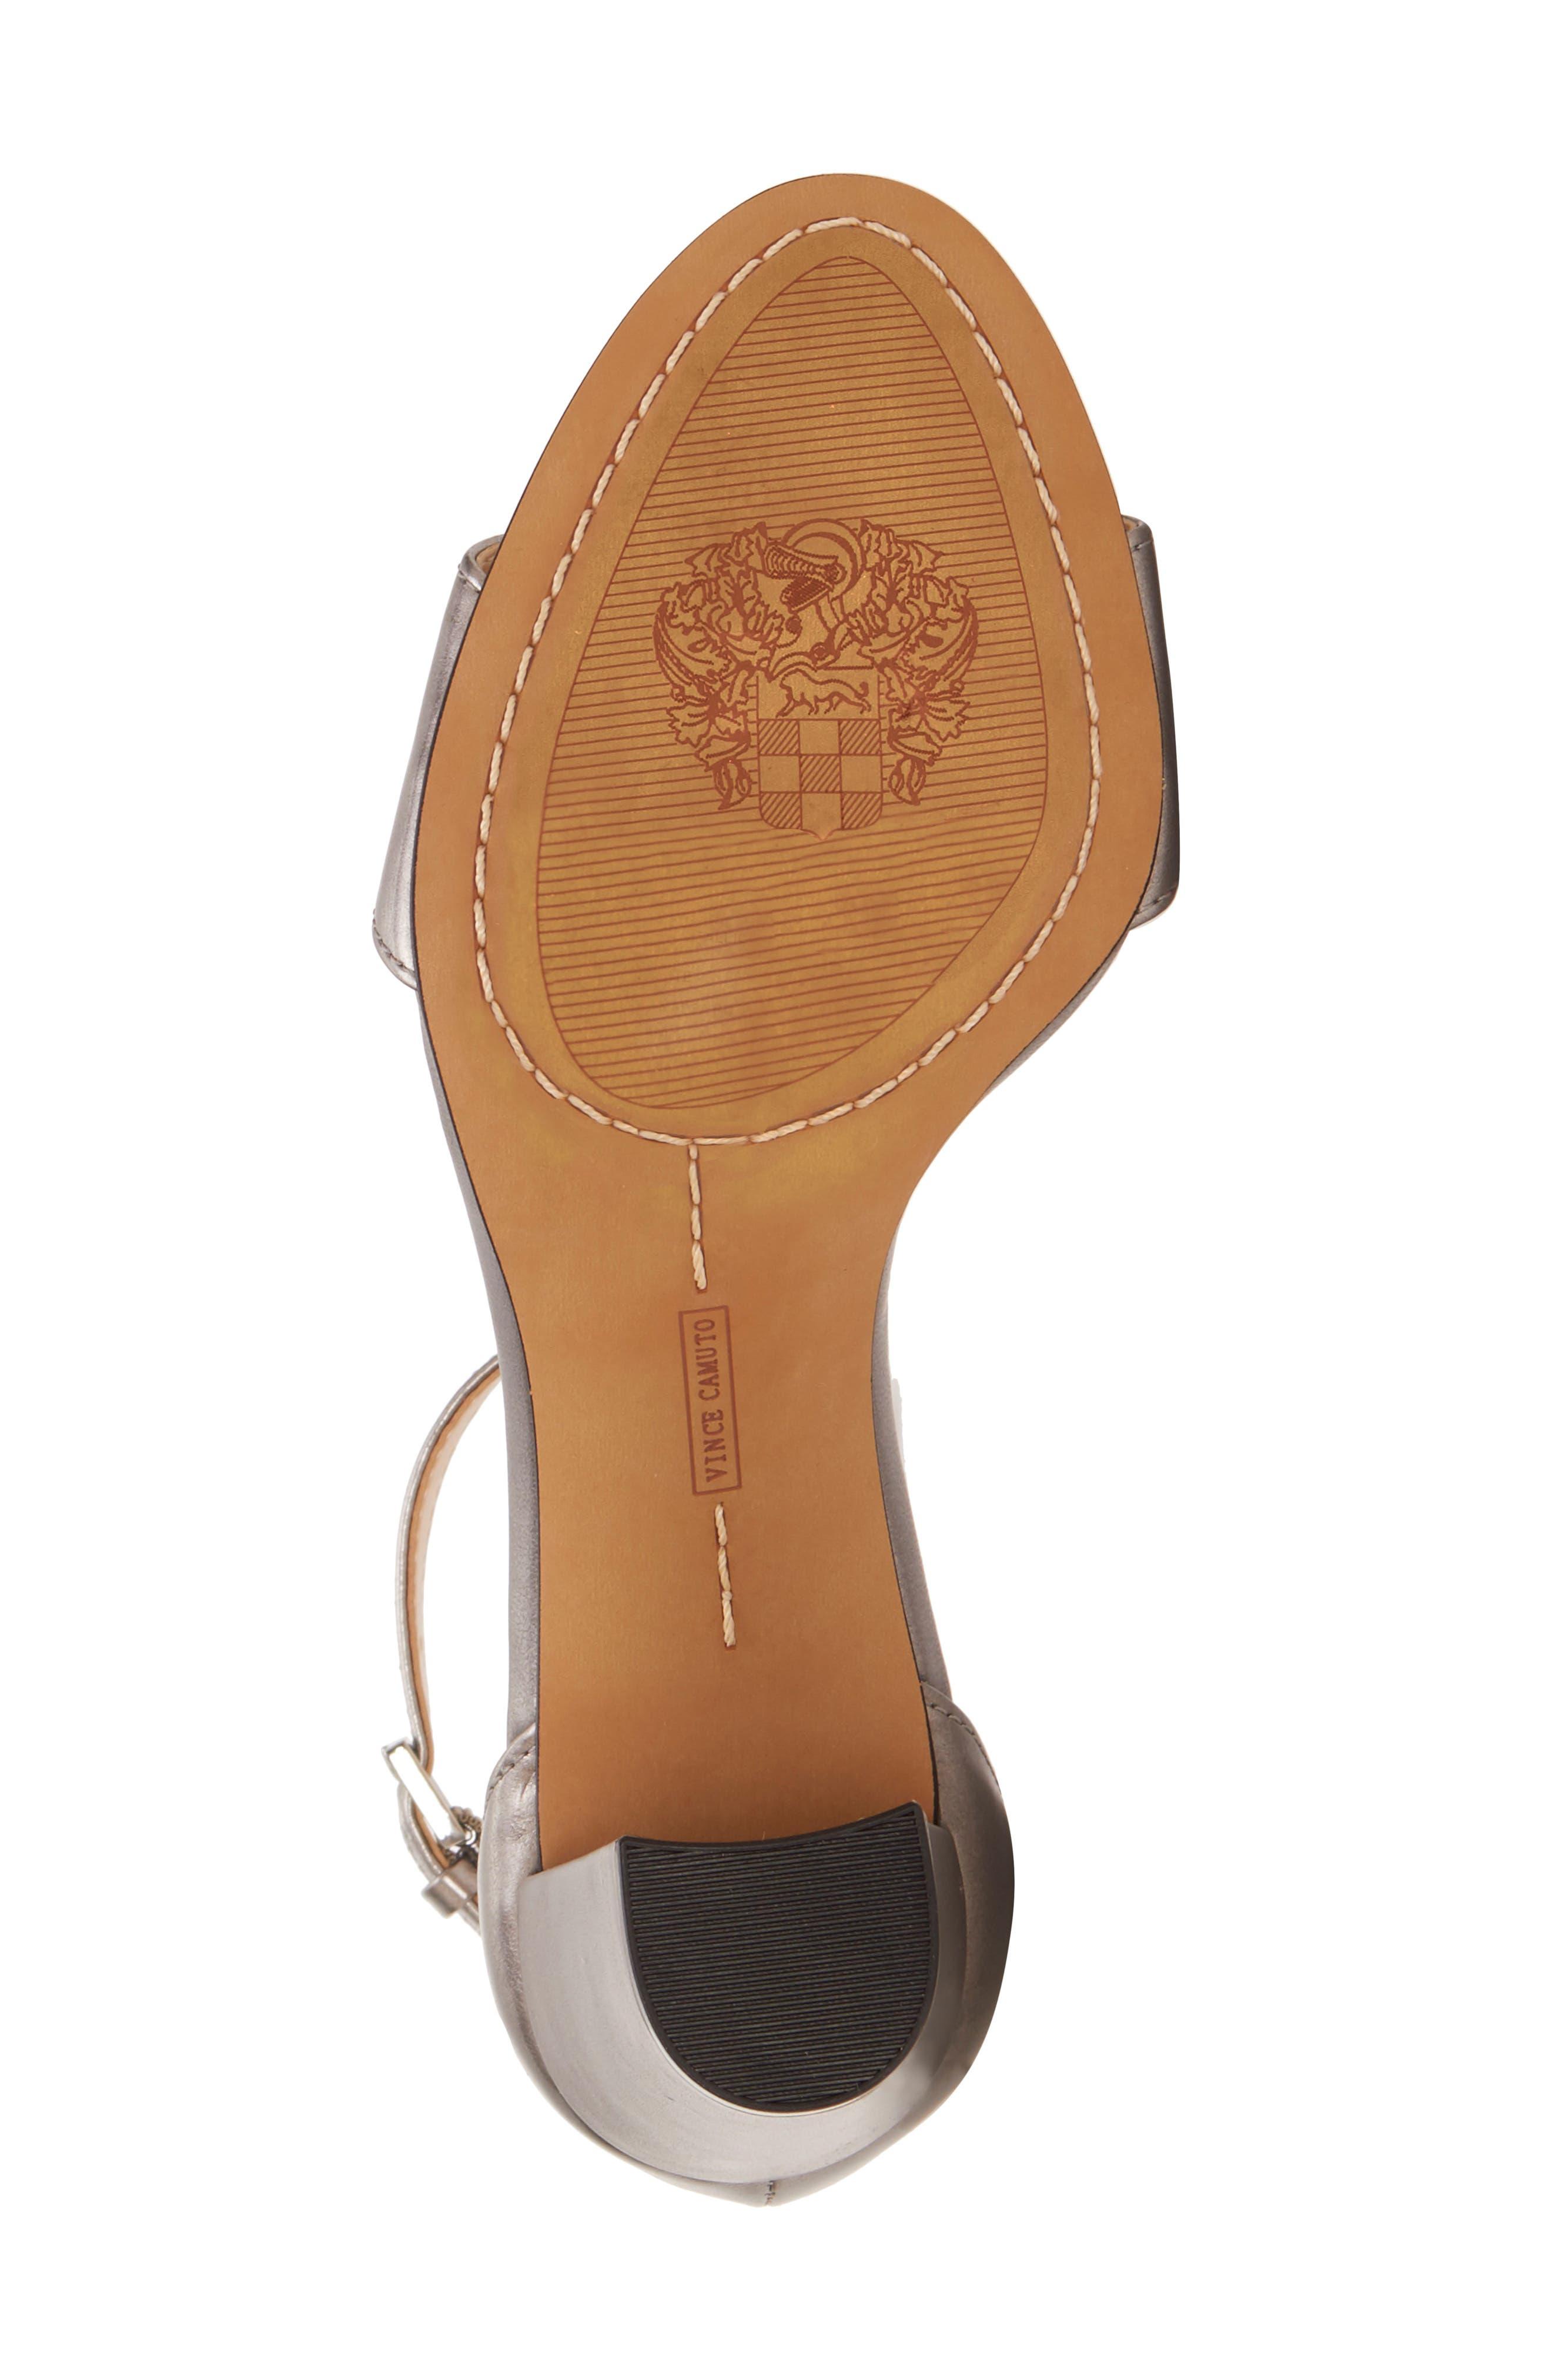 VINCE CAMUTO, Corlina Ankle Strap Sandal, Alternate thumbnail 6, color, METAL GREY